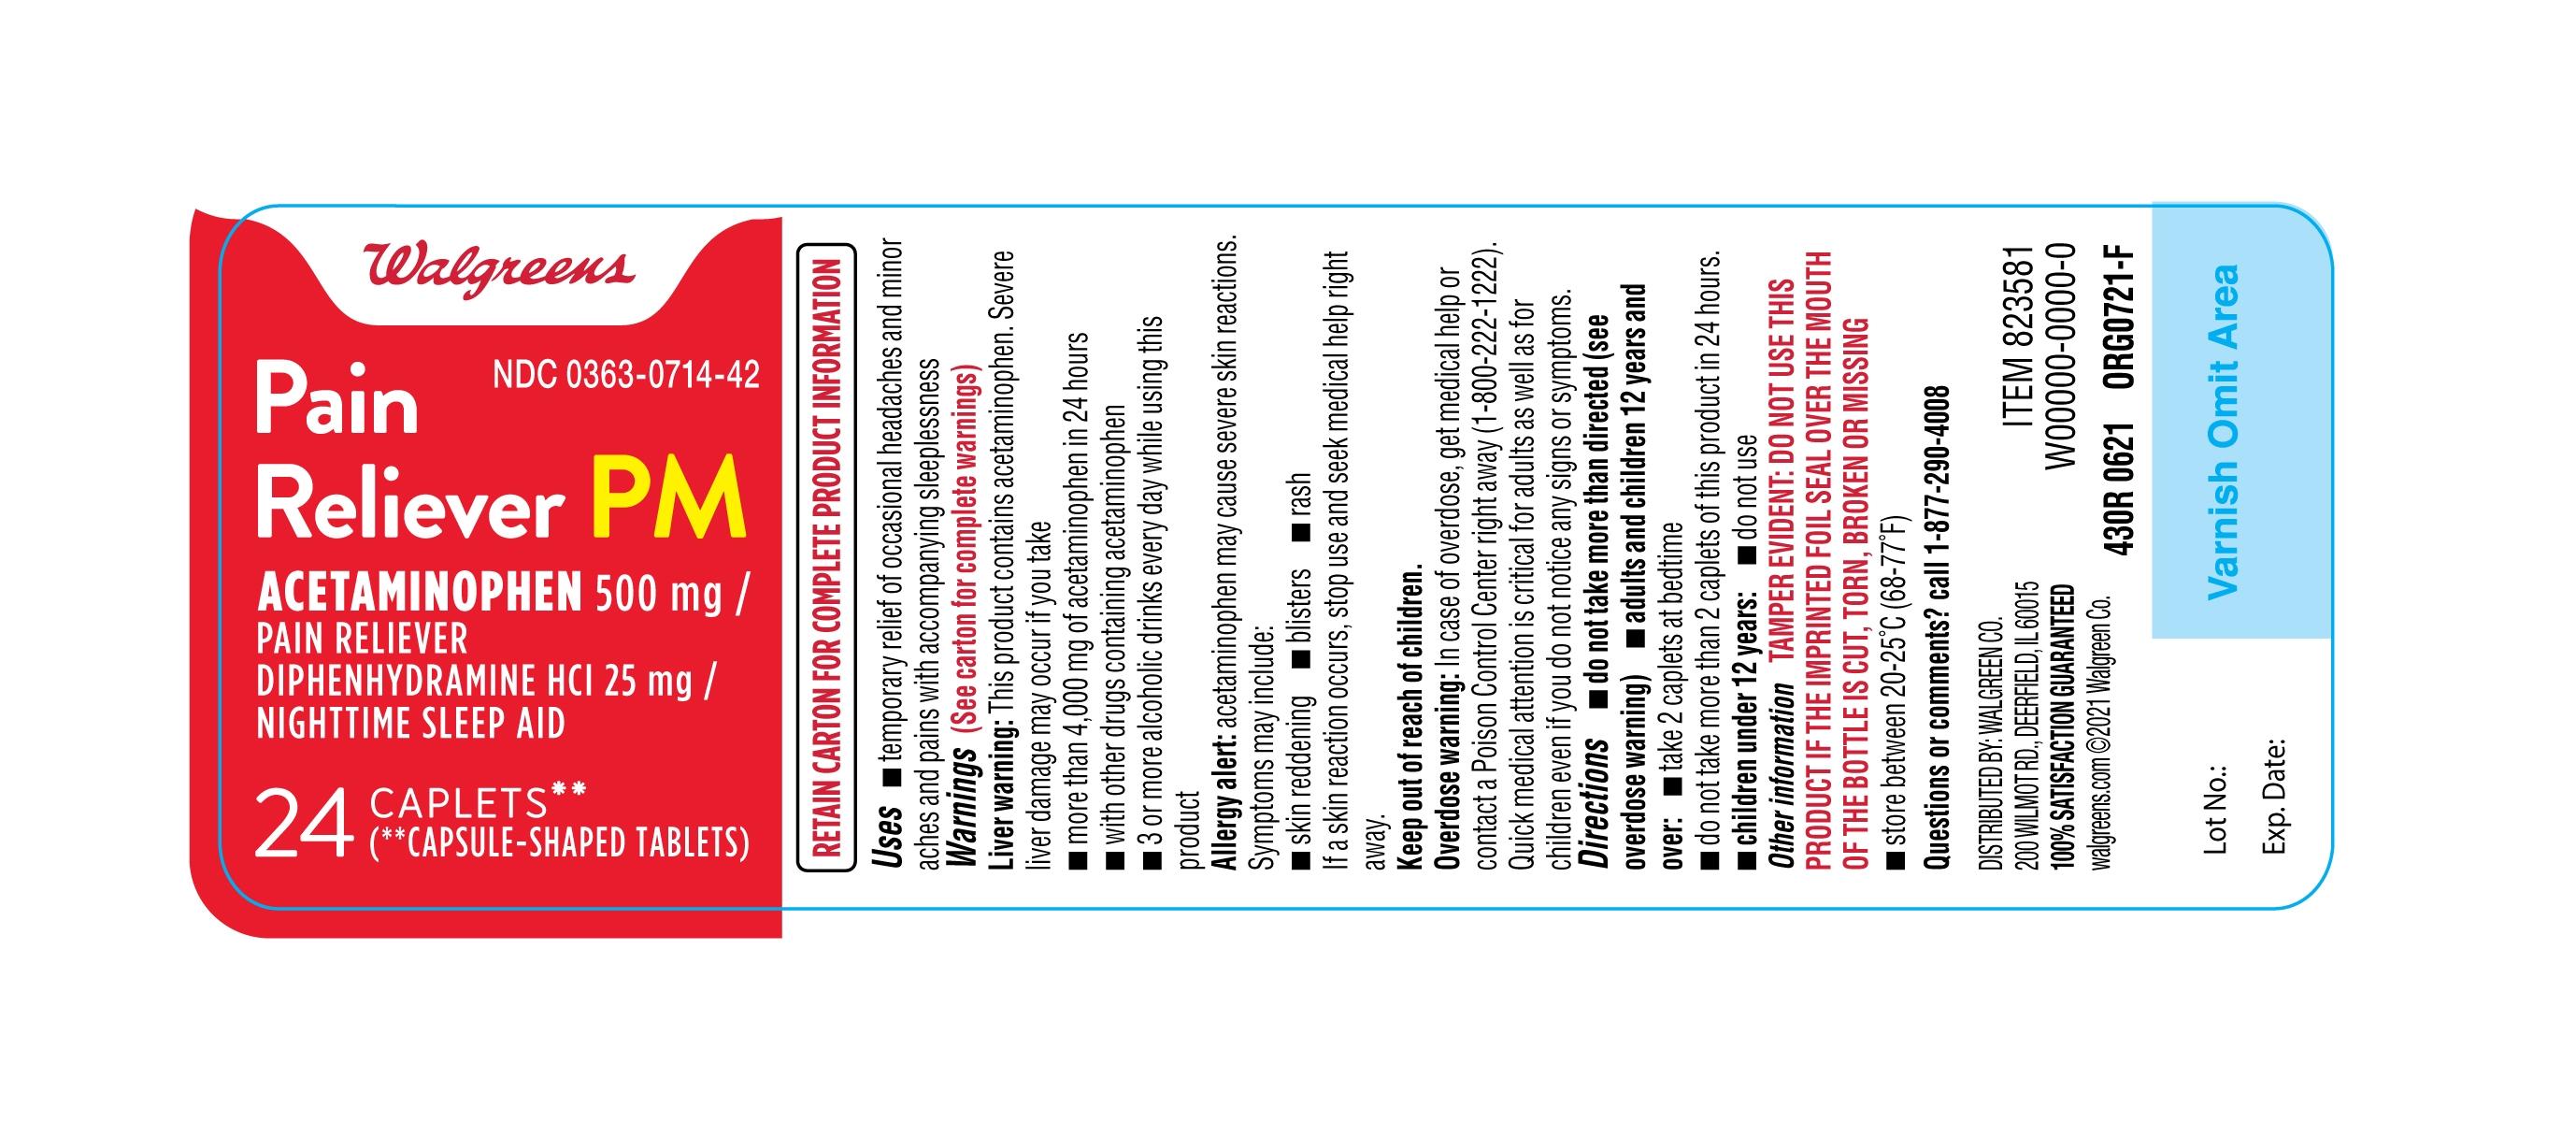 430R-Walgreens-Acetaminophen 500-mg-Diphenhydramine Hcl-bottle-label-24ct